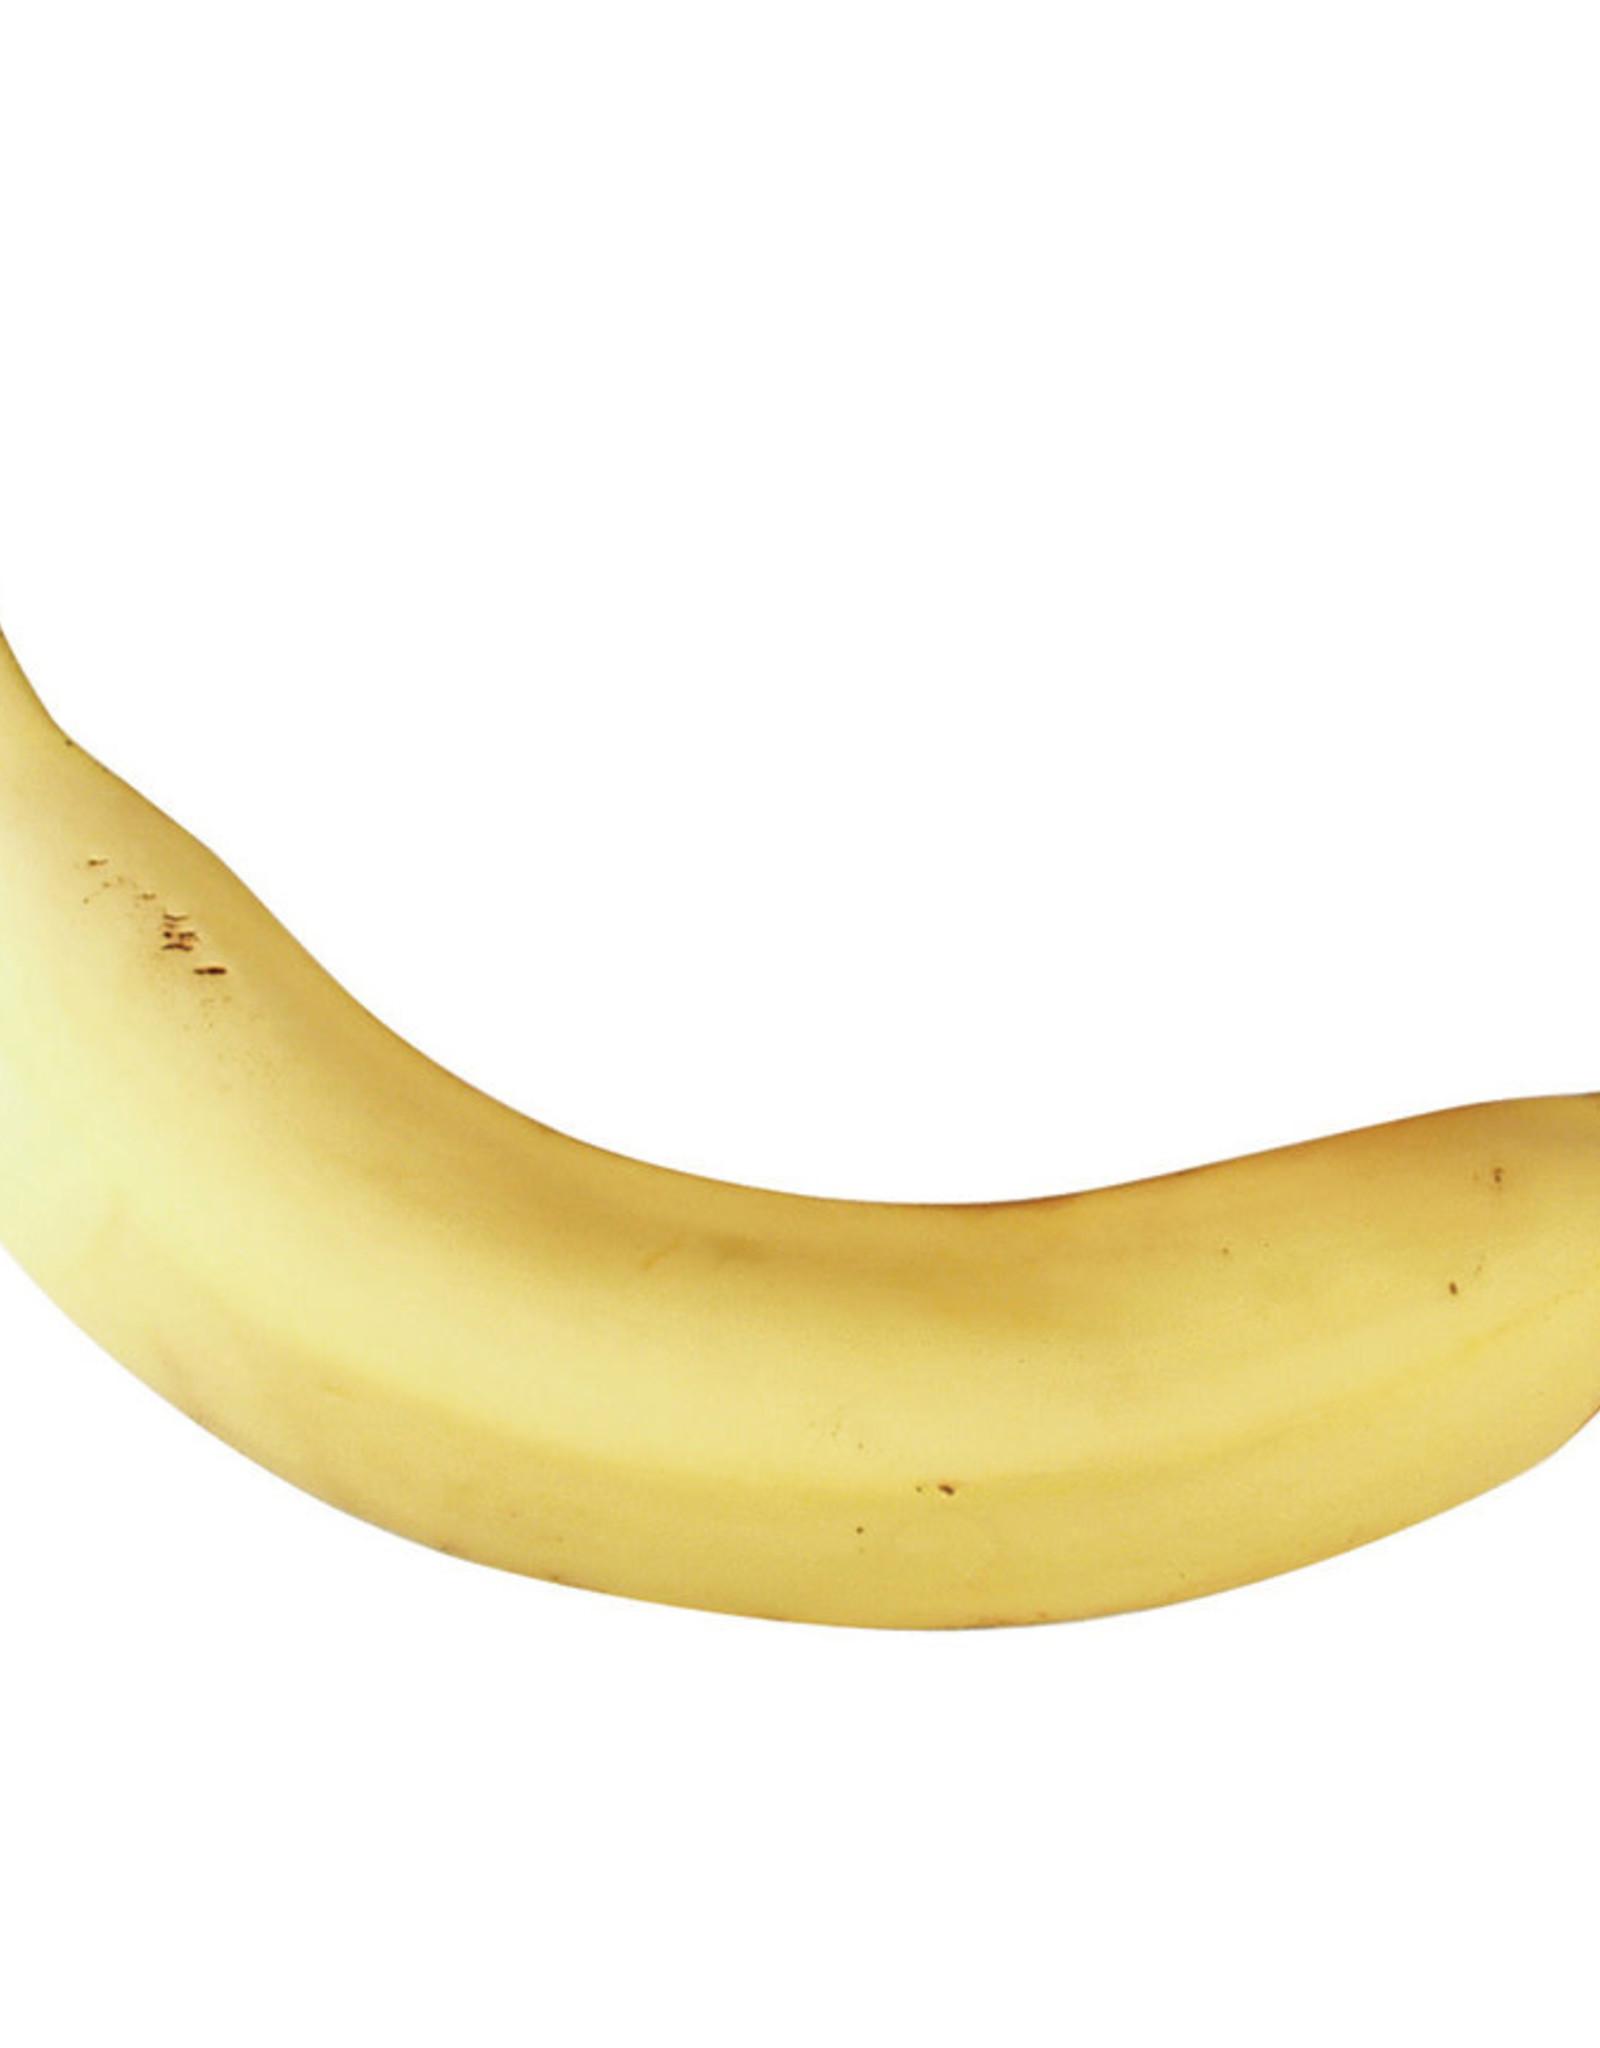 Rhythm Tech Rhythm Tech Fruit Shaker, Banana